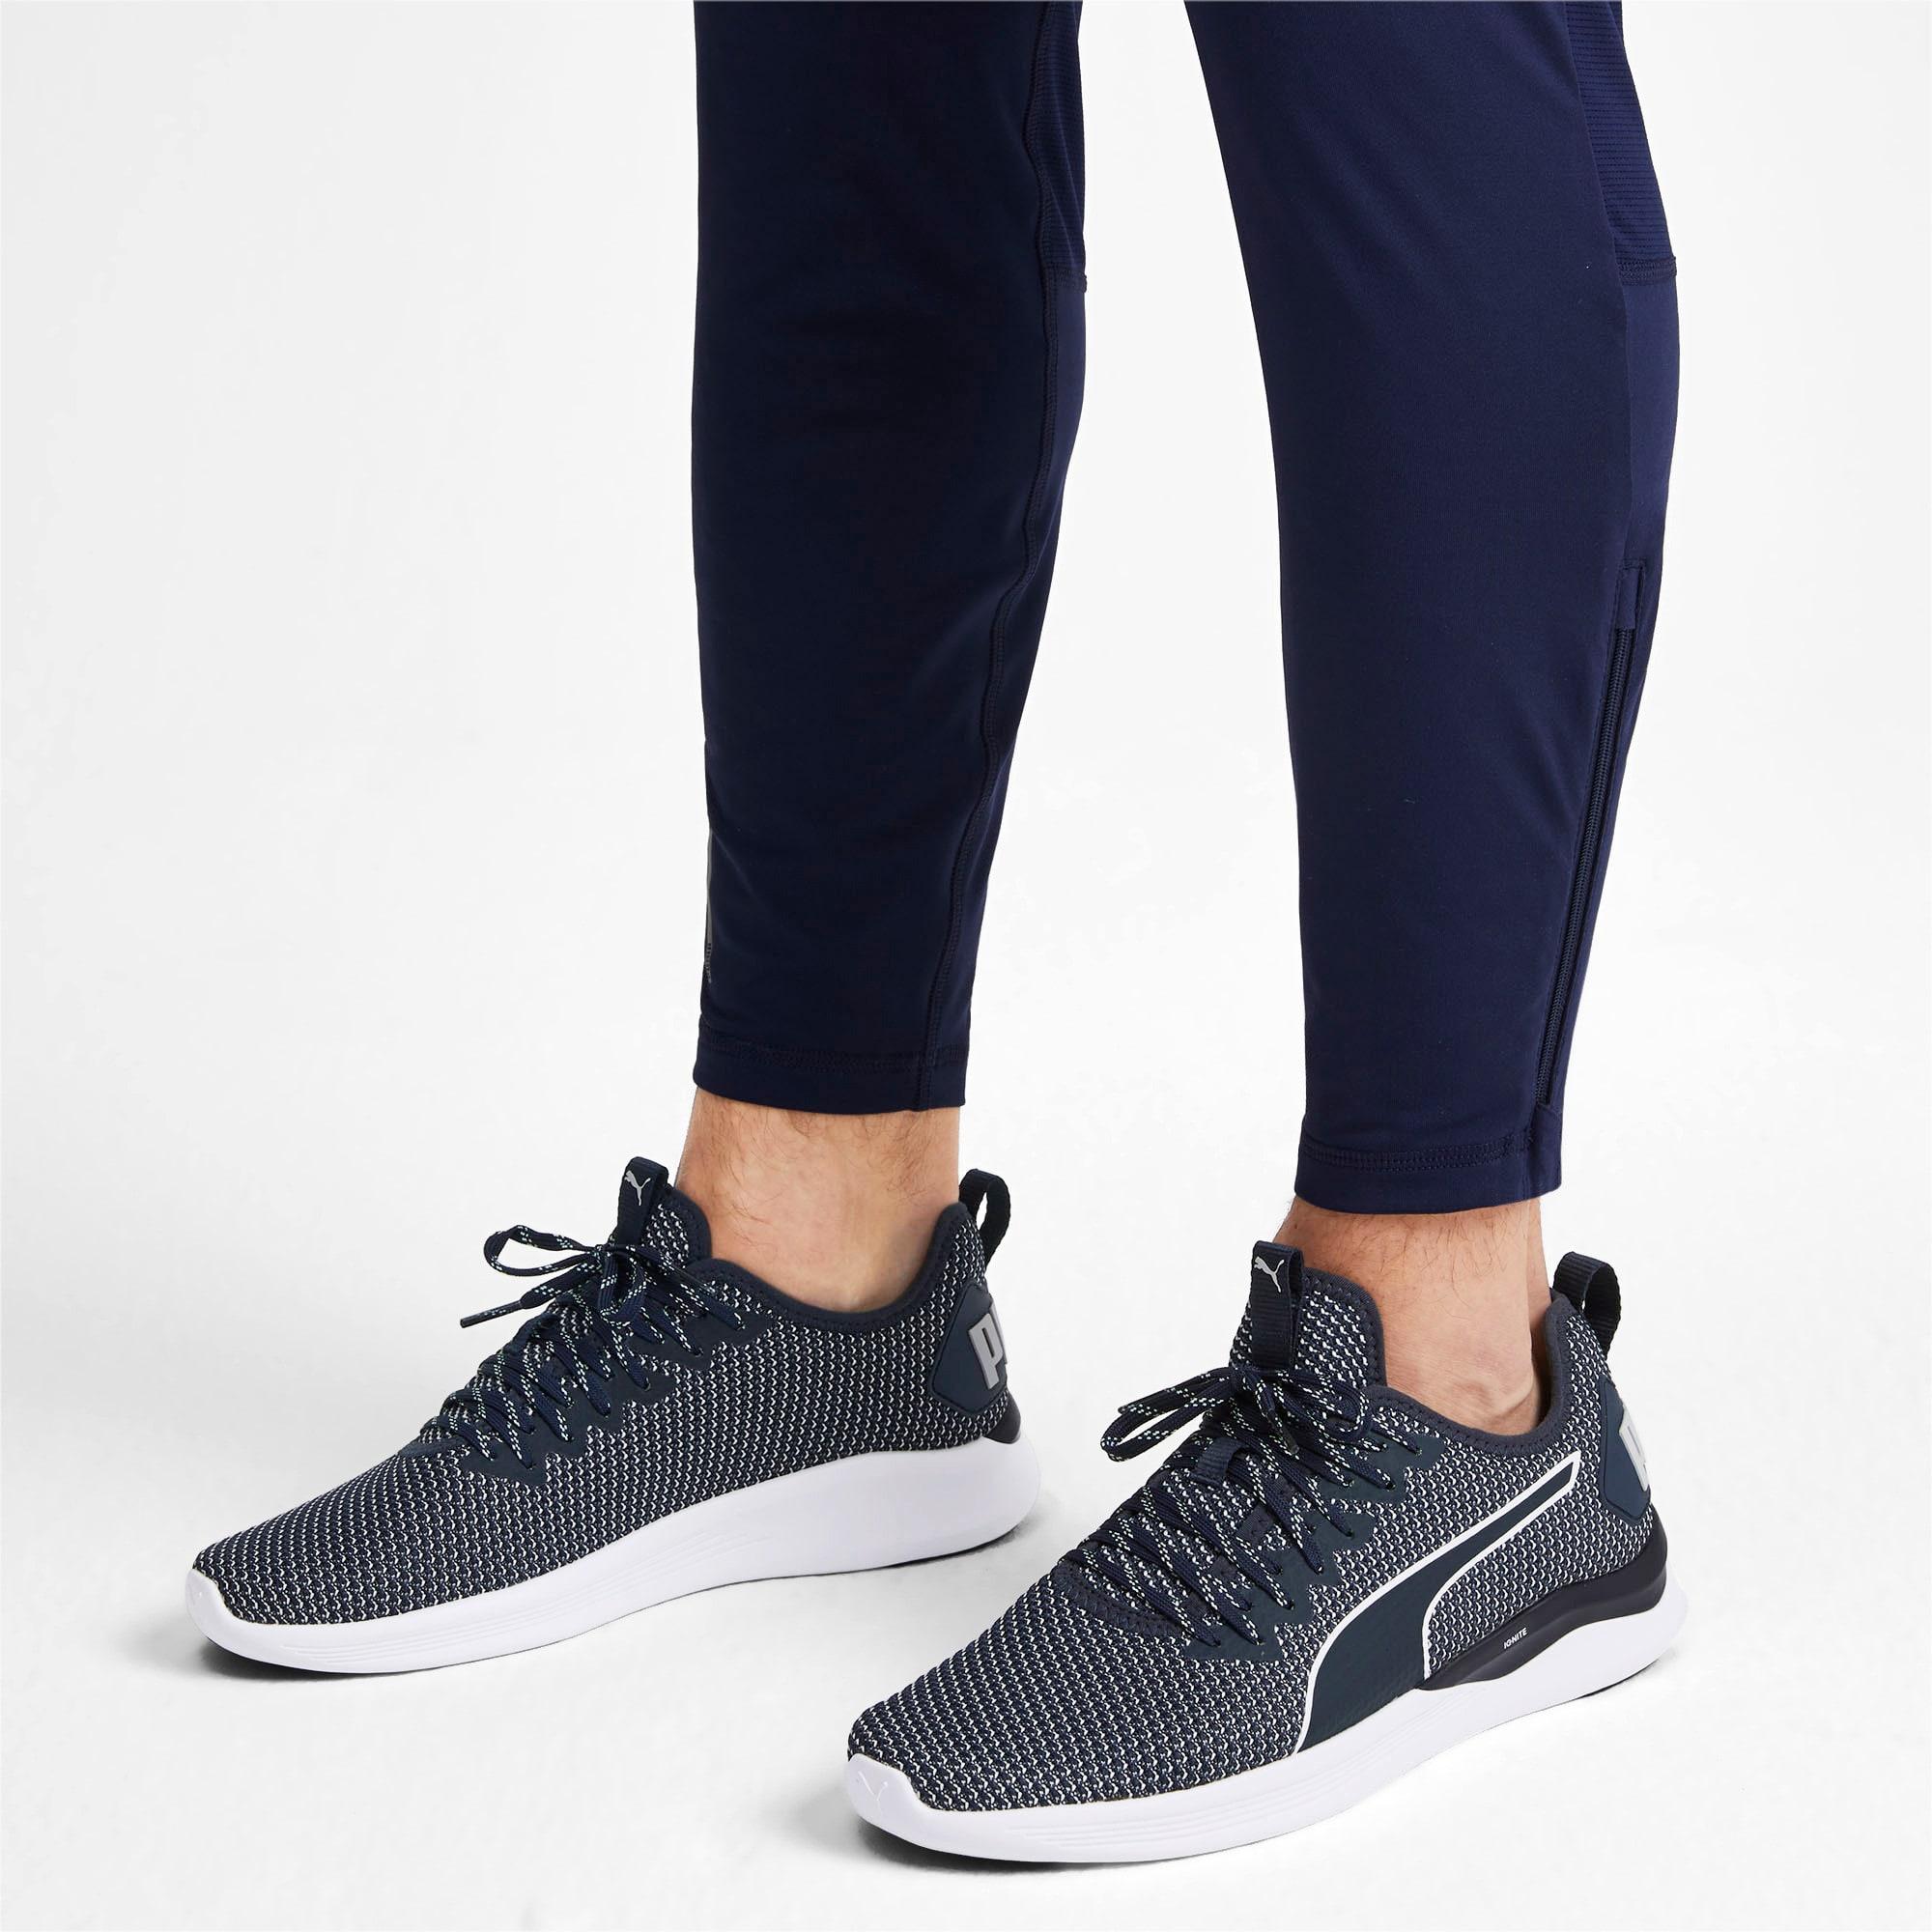 Thumbnail 3 of IGNITE Flash Men's Training Shoes, Peacoat-Glacier Gray-White, medium